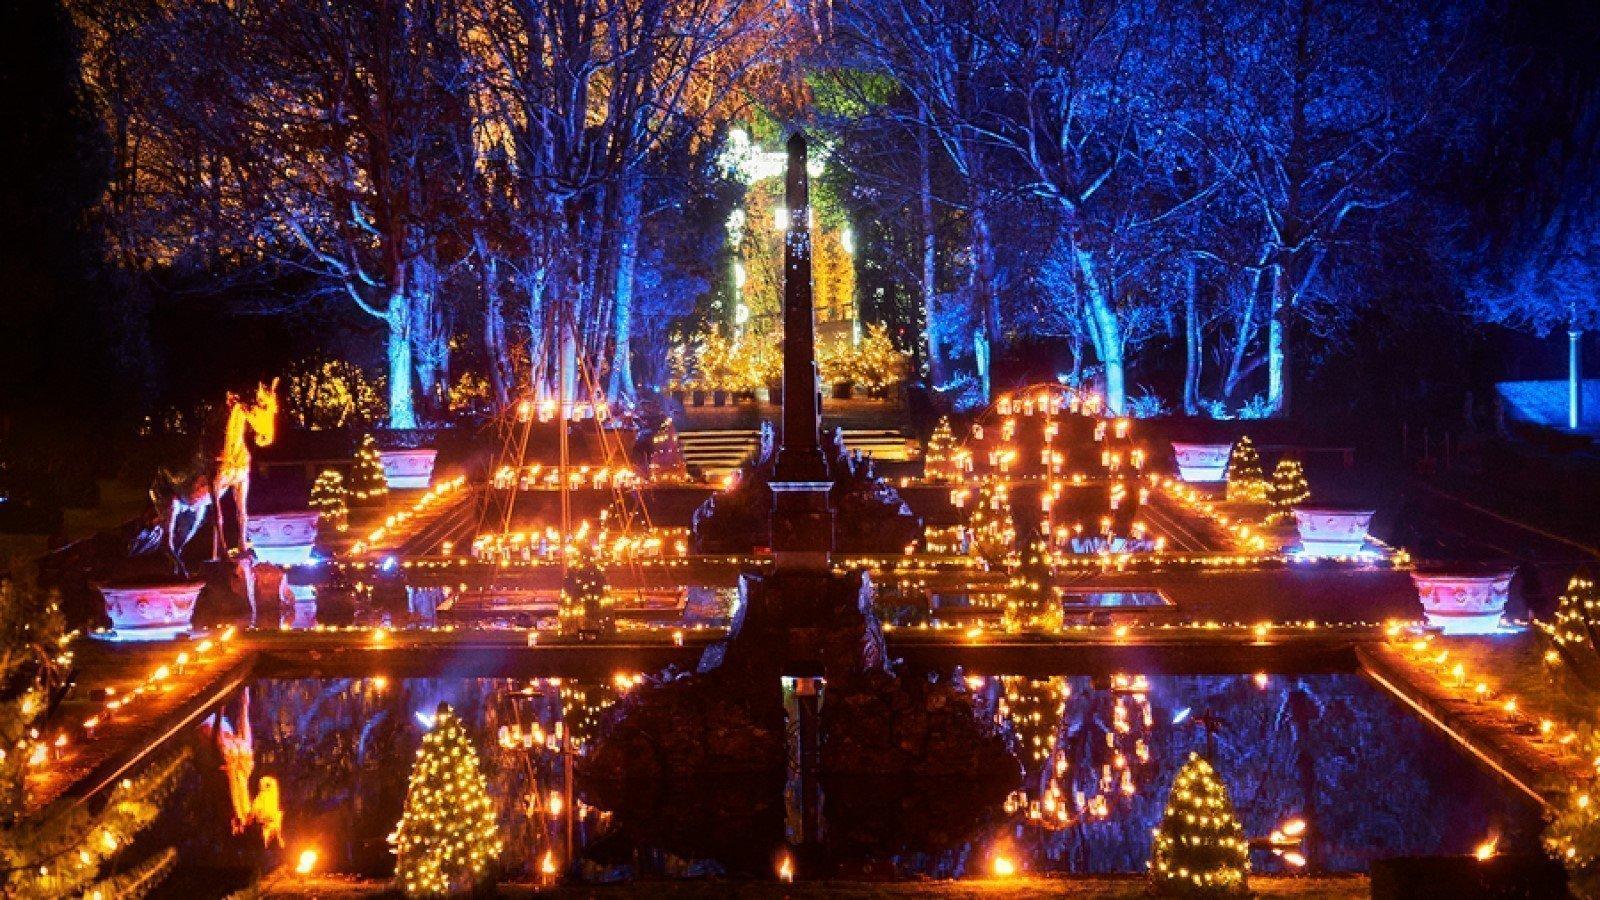 Blenheim Palace Illuminated Christmas Lights Trail 2021